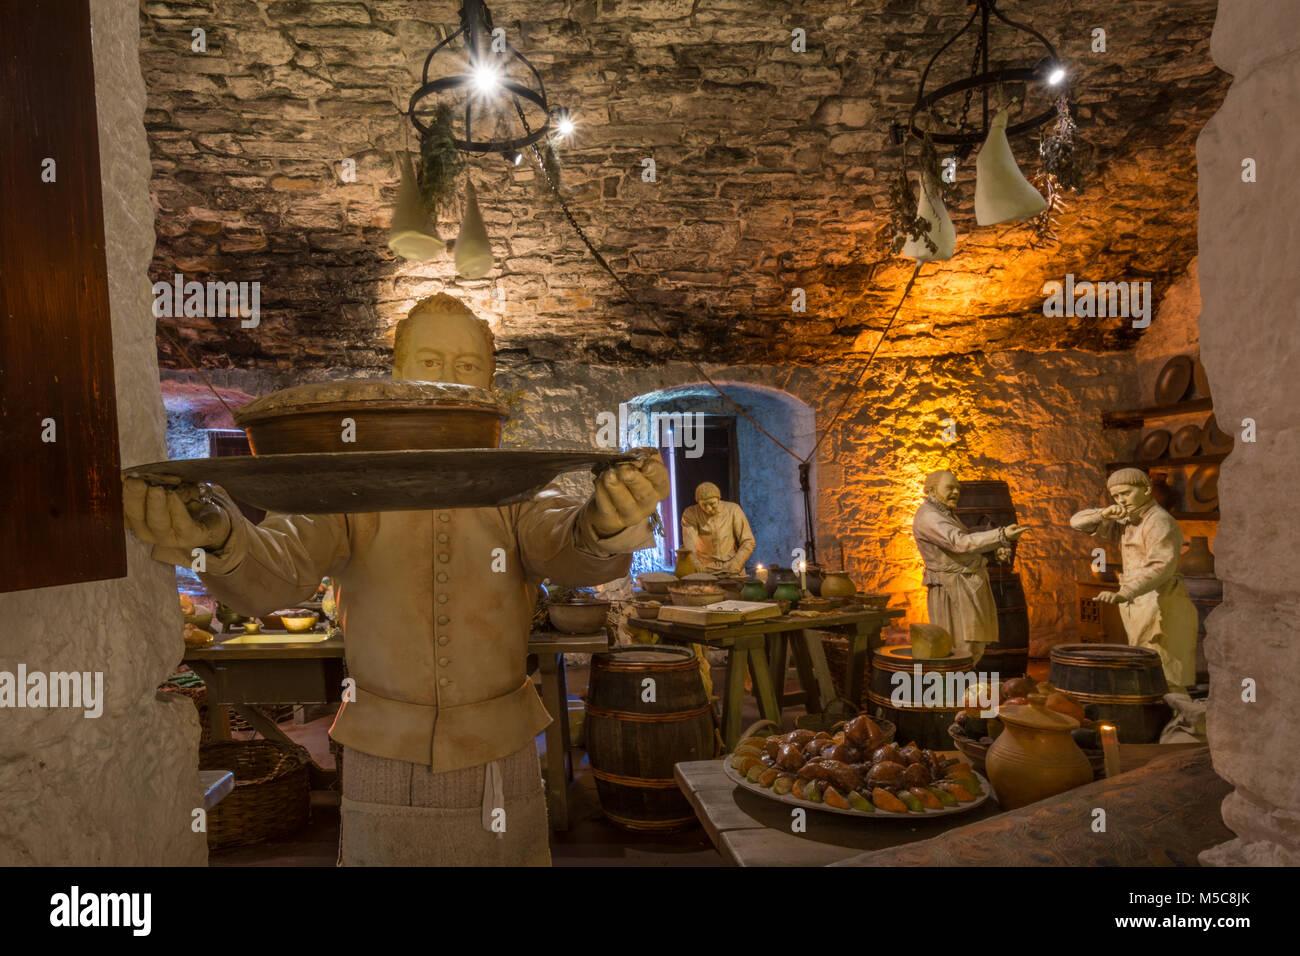 The Great Kitchens, Stirling Castle, Scotland, UK - Stock Image